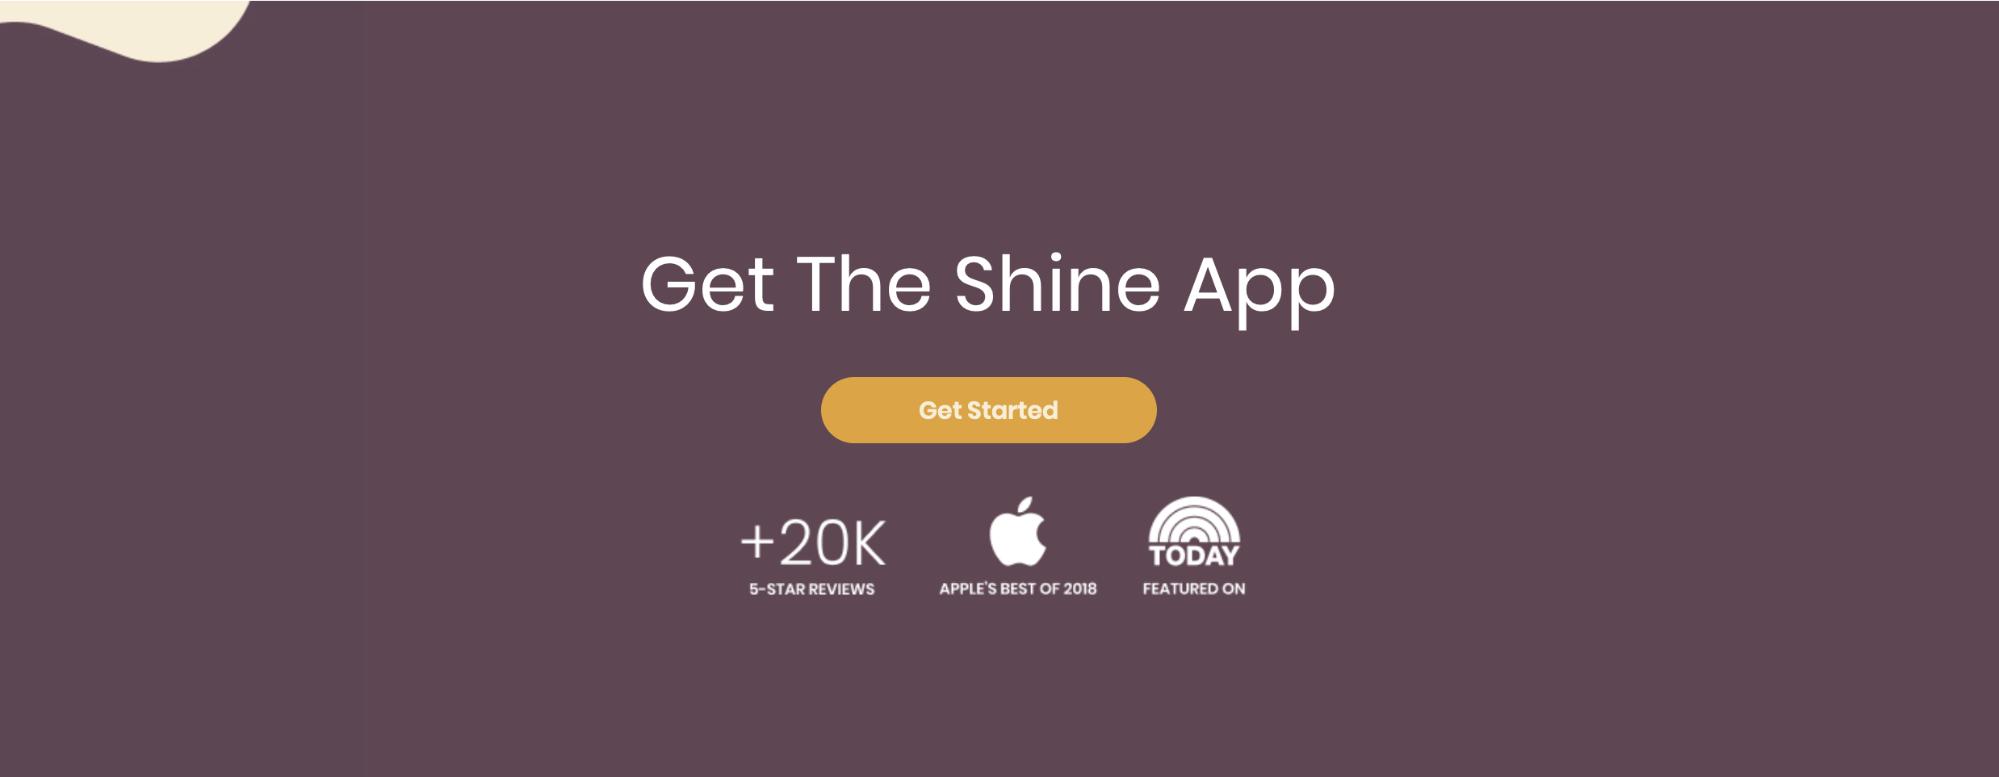 get the shine app